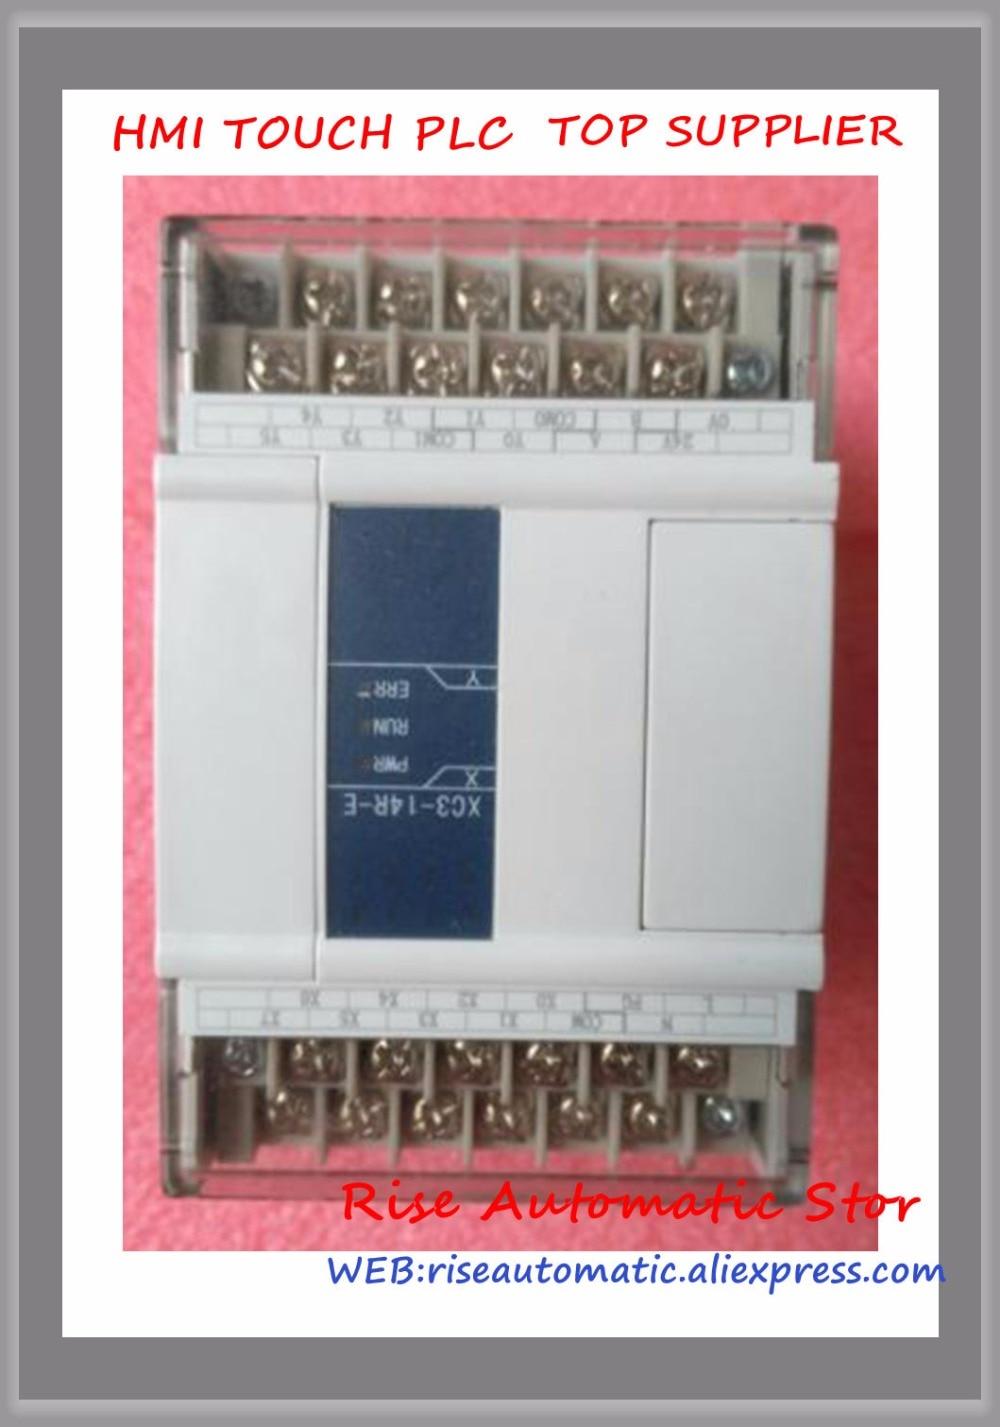 New Original Programmable Controller Module XC3-14R-E PLC AC220V DI 8 DO 6 RelayNew Original Programmable Controller Module XC3-14R-E PLC AC220V DI 8 DO 6 Relay